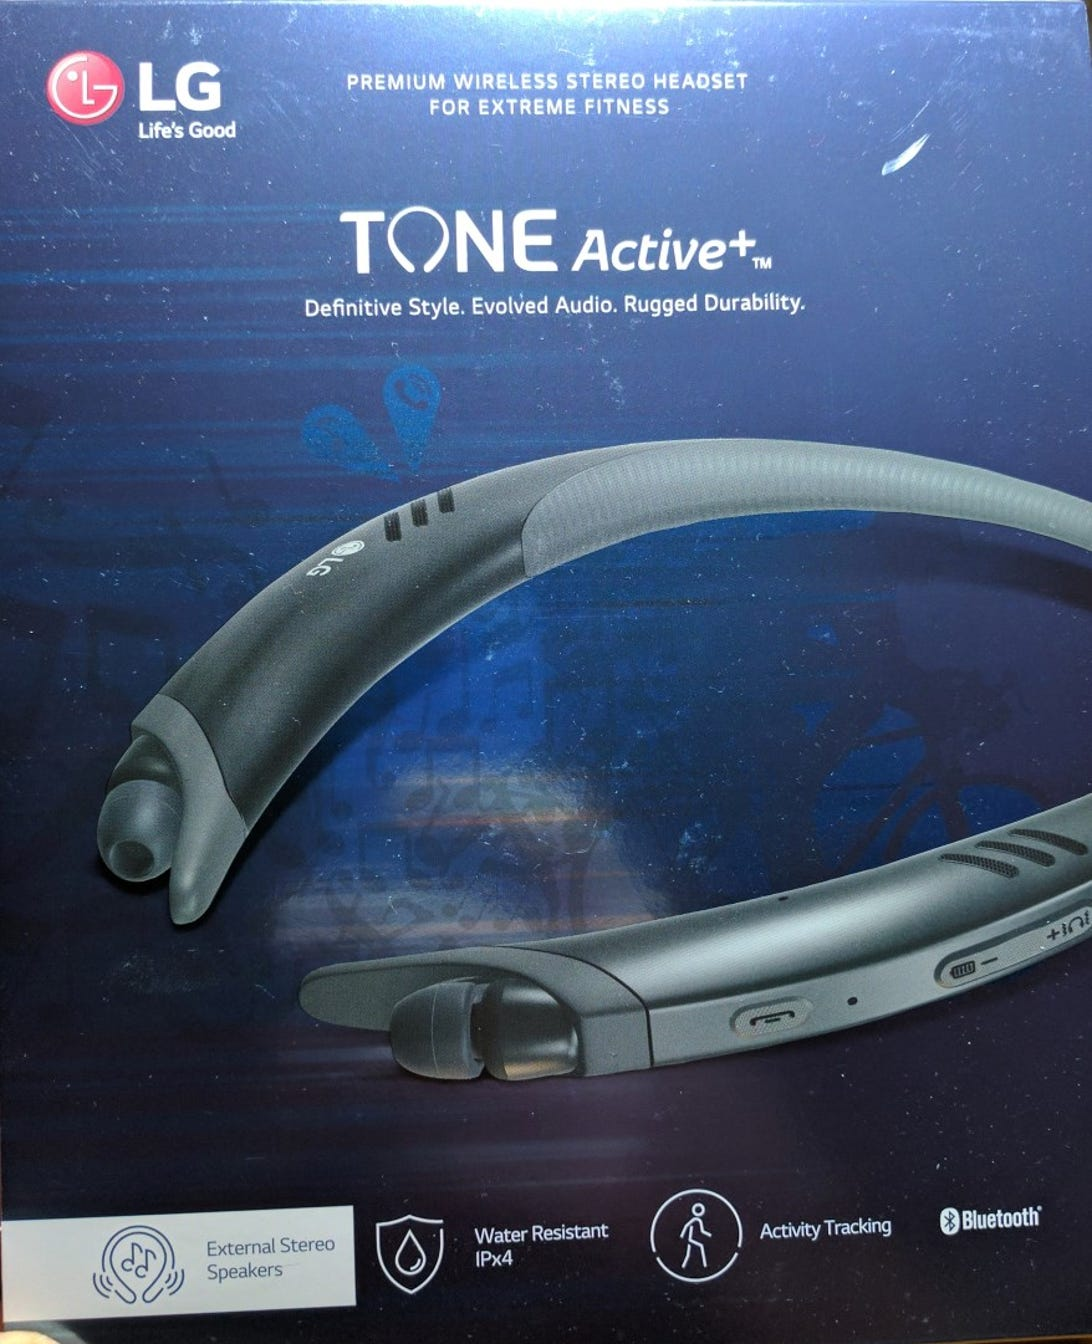 lg-tone-activeplus-3.jpg